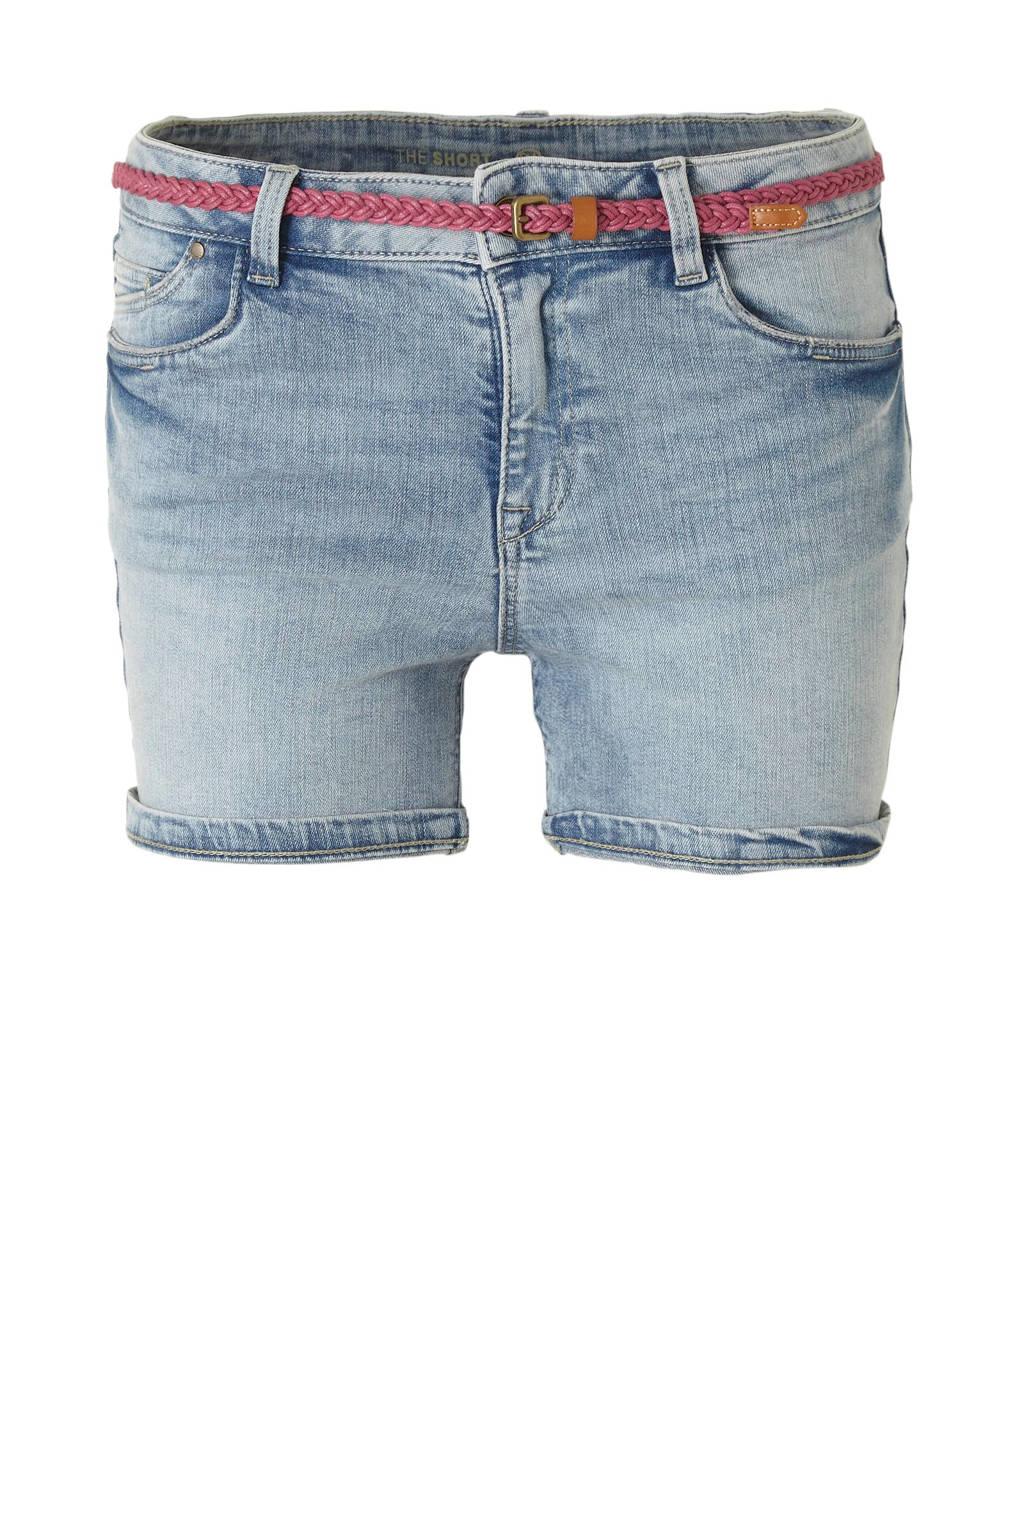 C&A The Denim slim fit jeans short, Light denim